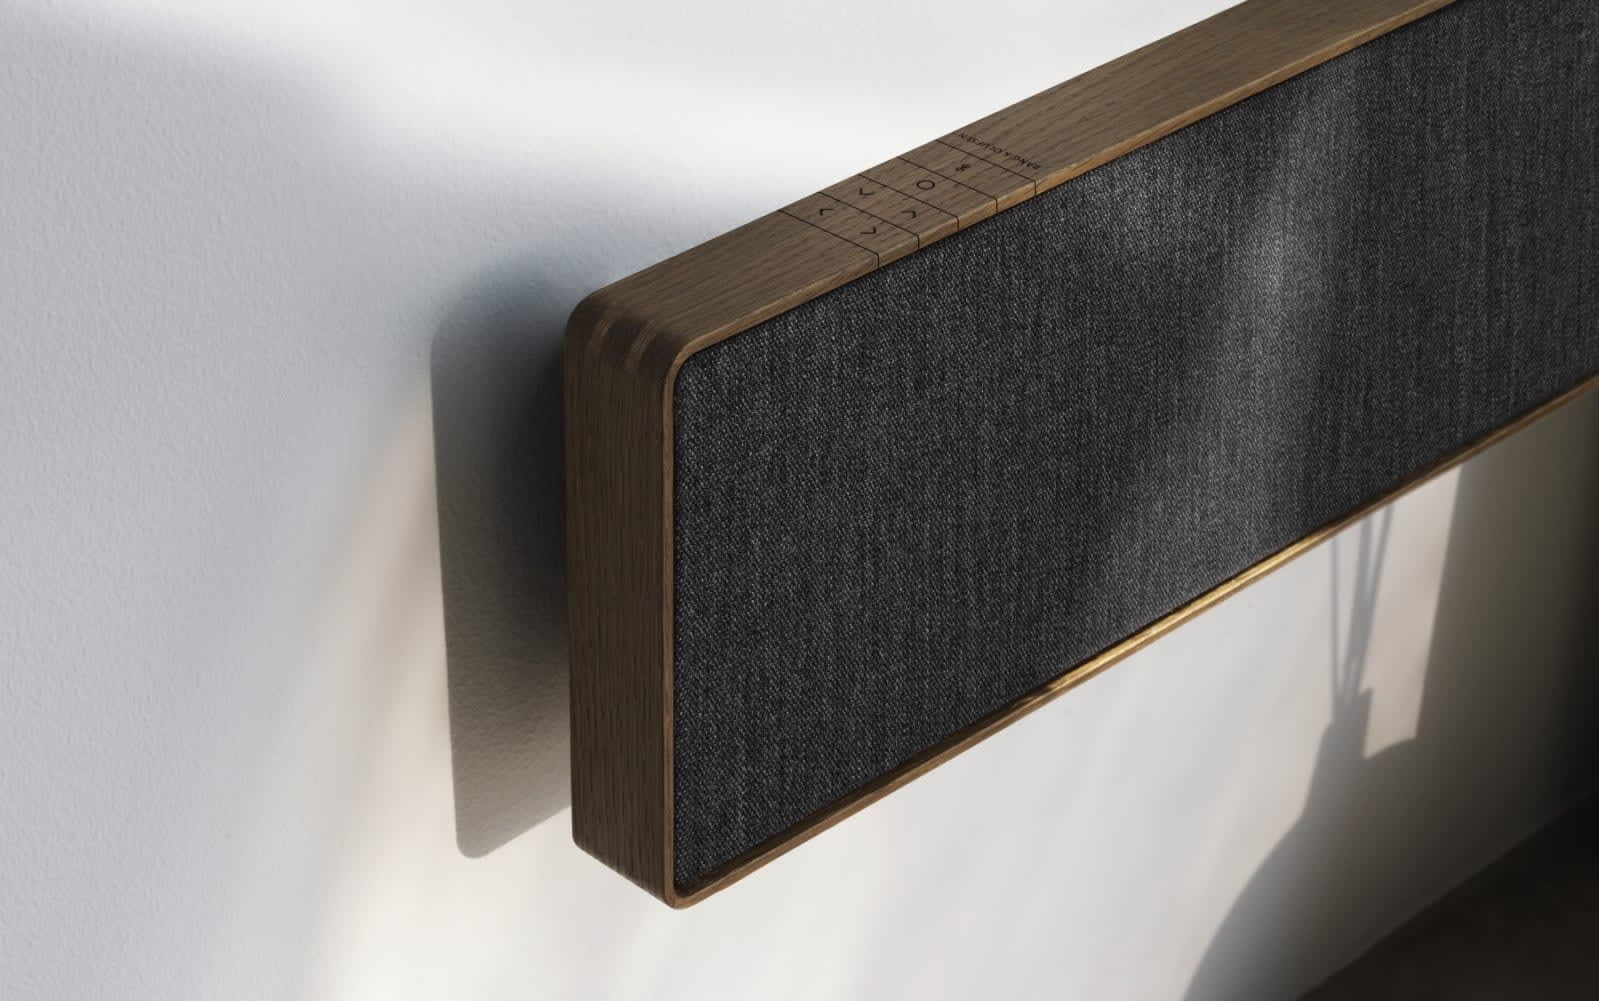 B&O's first soundbar packs Dolby Atmos, Chromecast and AirPlay 2